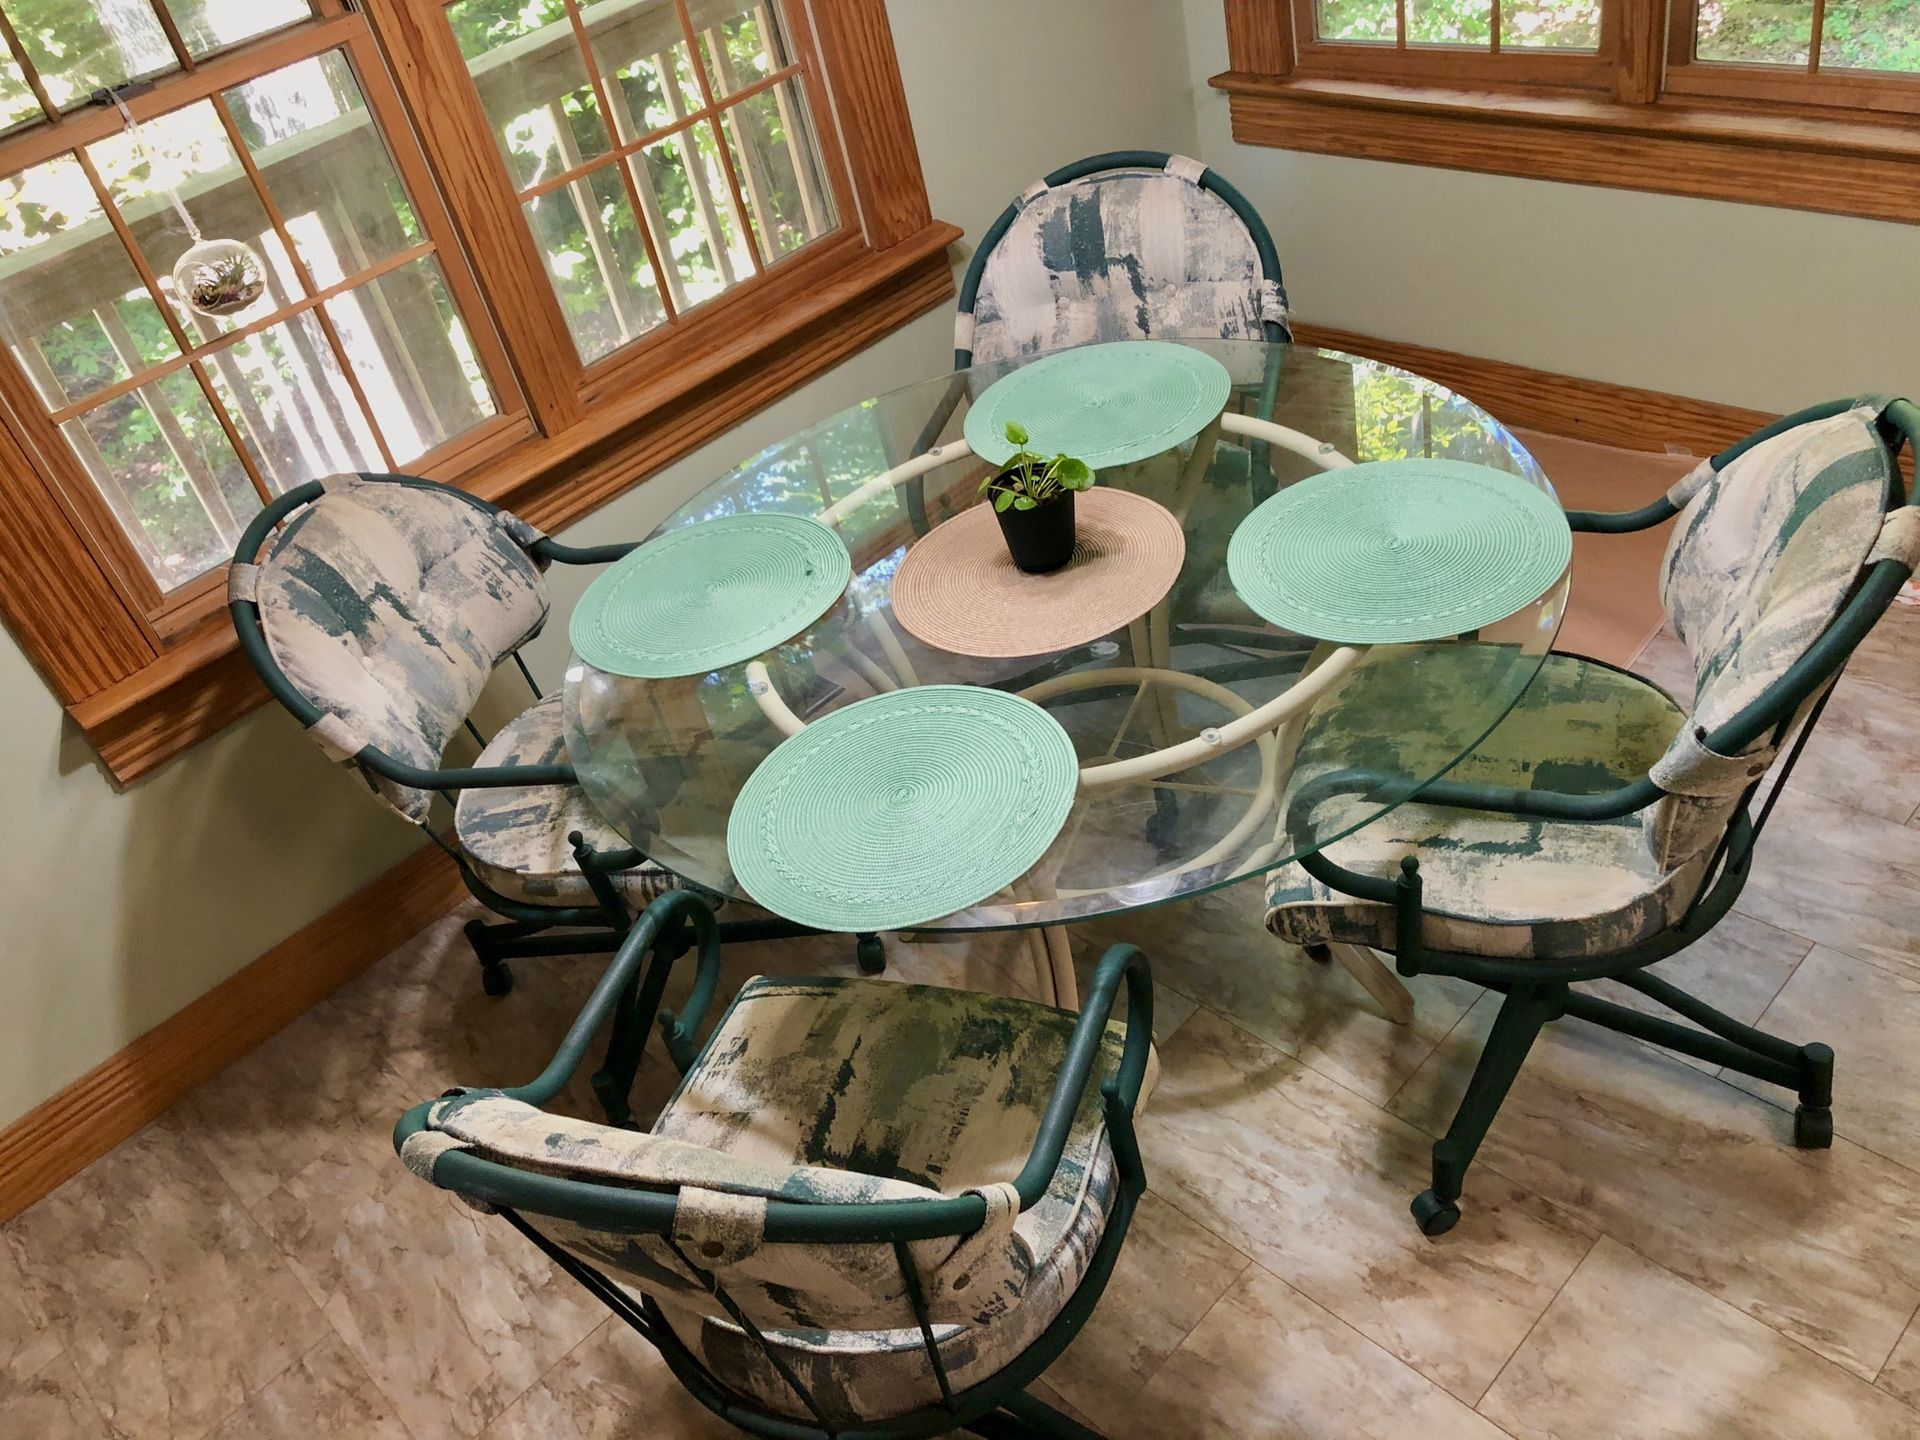 Douglas furniture kitchen / patio table + 4 chairs